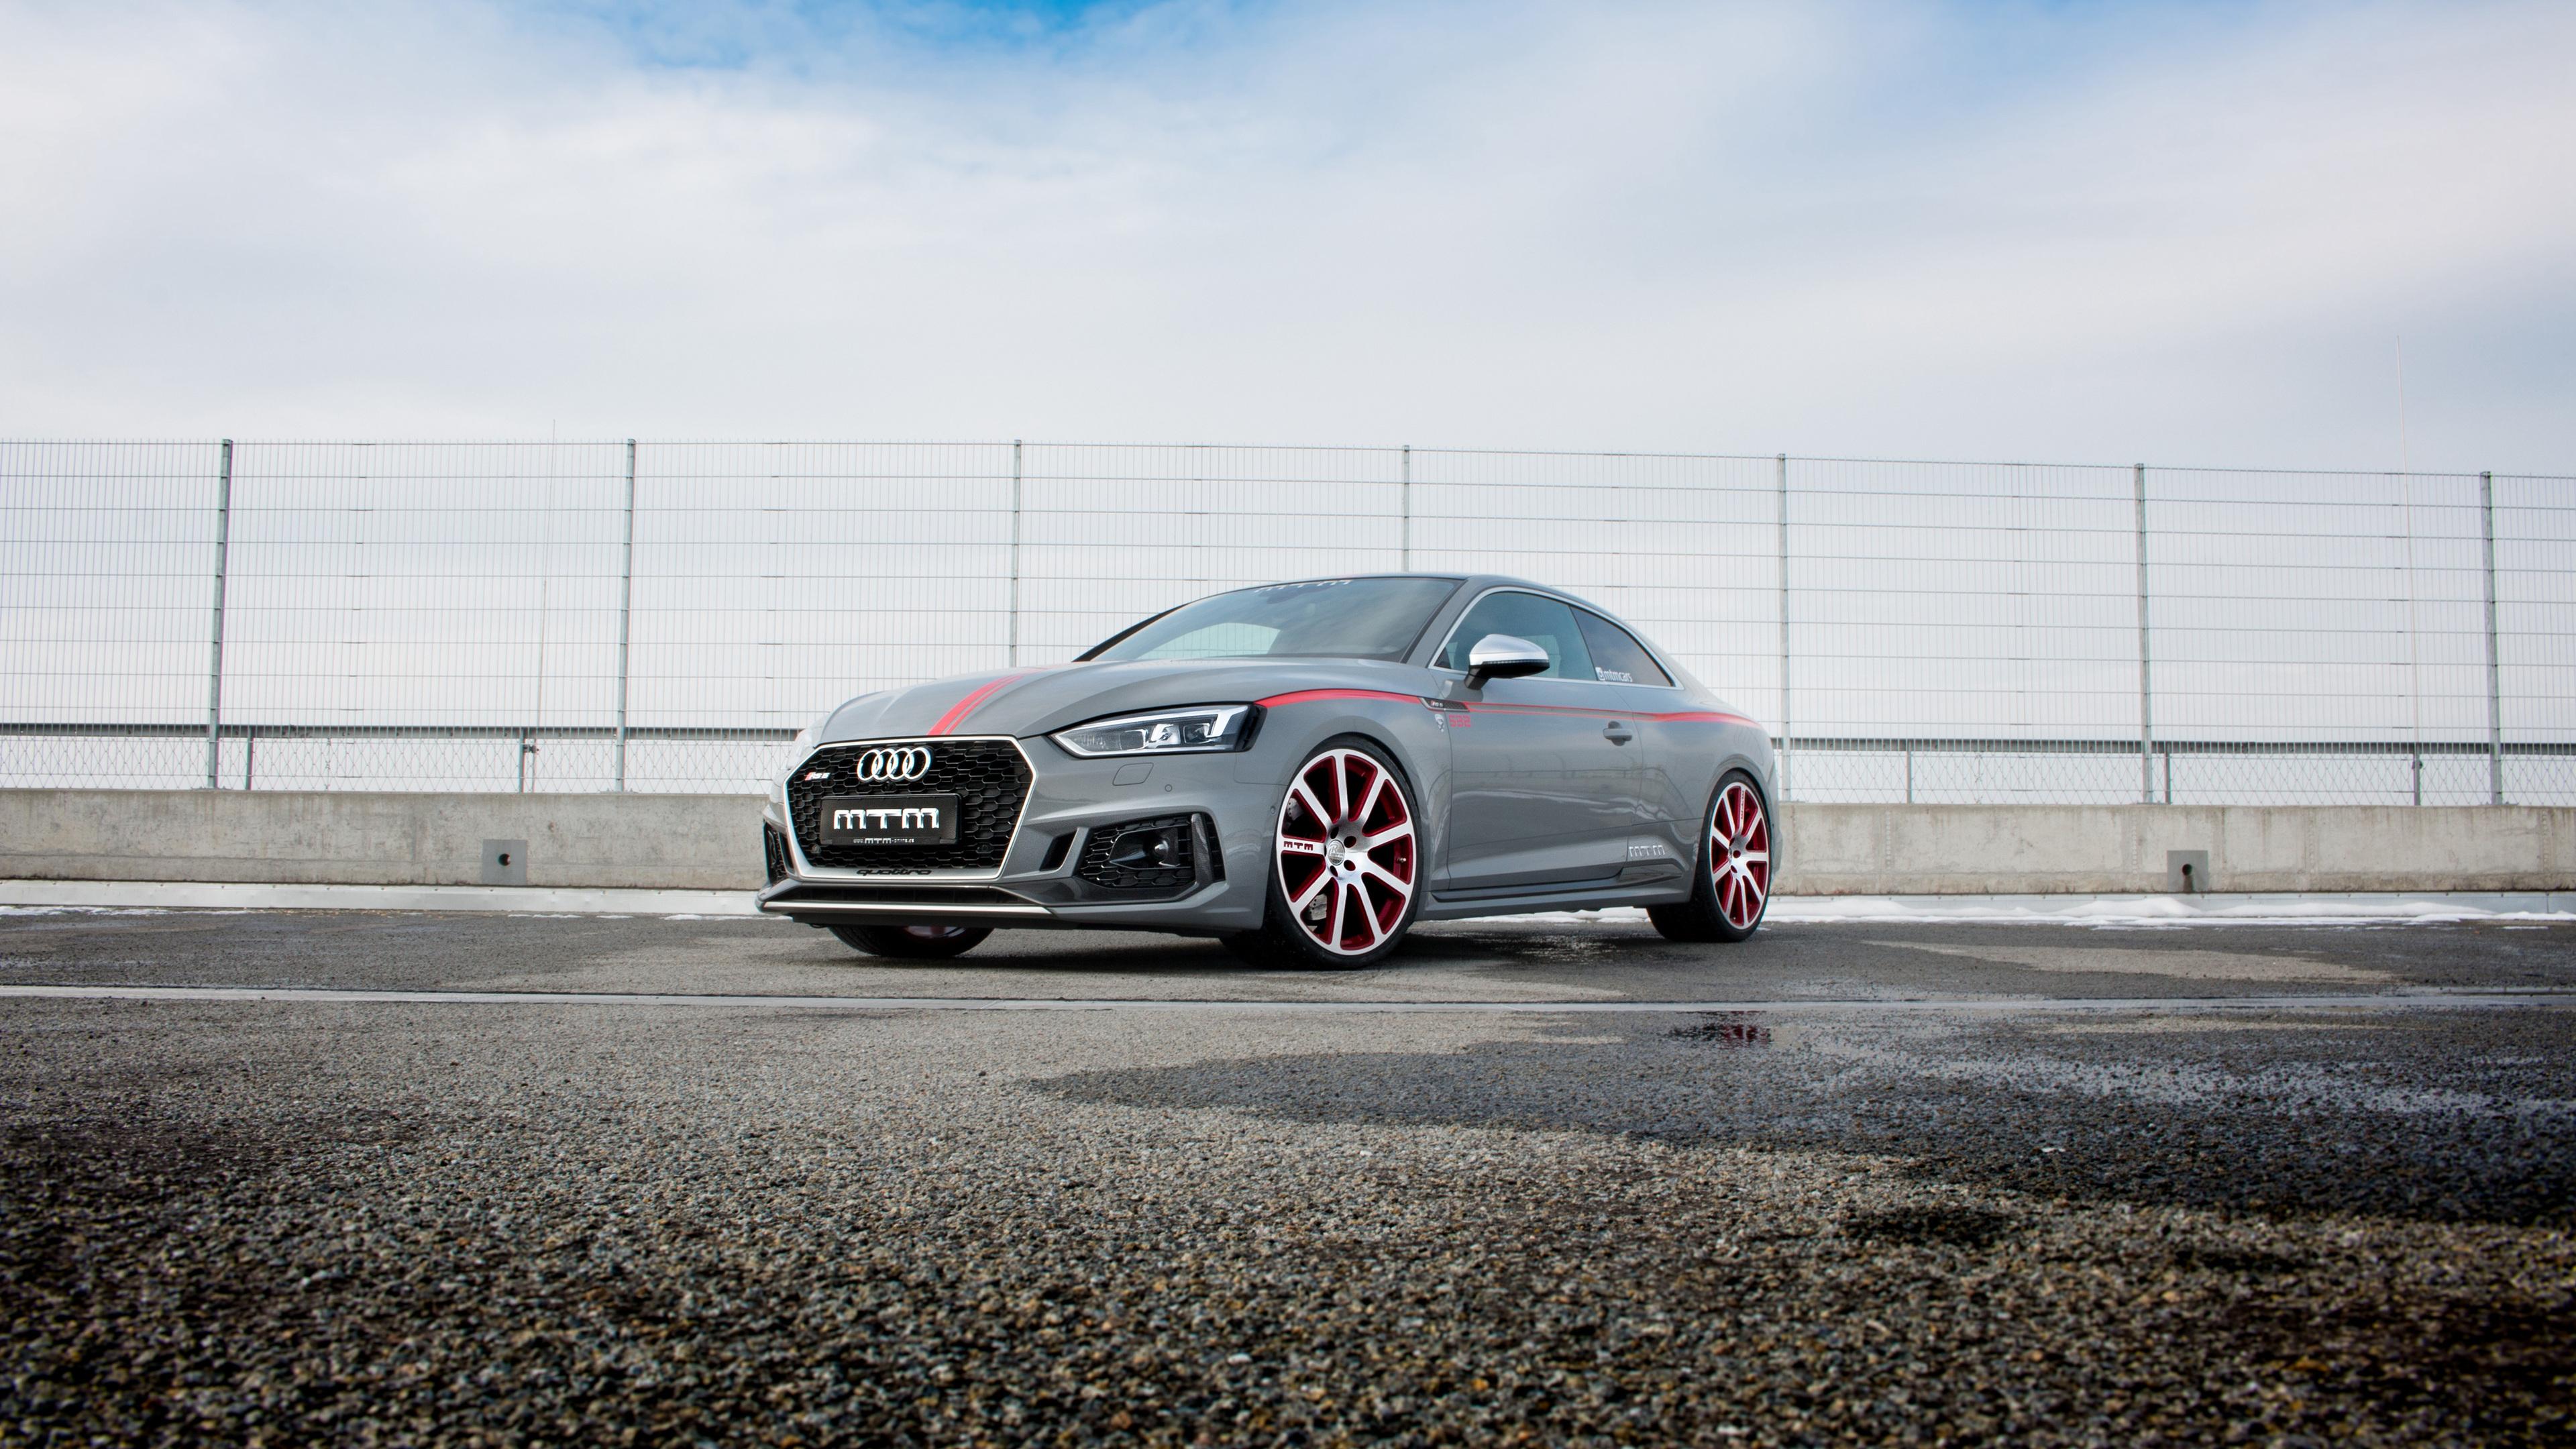 2018 mtm audi rs 5 r 4k 1539110059 - 2018 MTM Audi RS 5 R 4k - hd-wallpapers, cars wallpapers, audi wallpapers, audi rs5 wallpapers, 4k-wallpapers, 2018 cars wallpapers